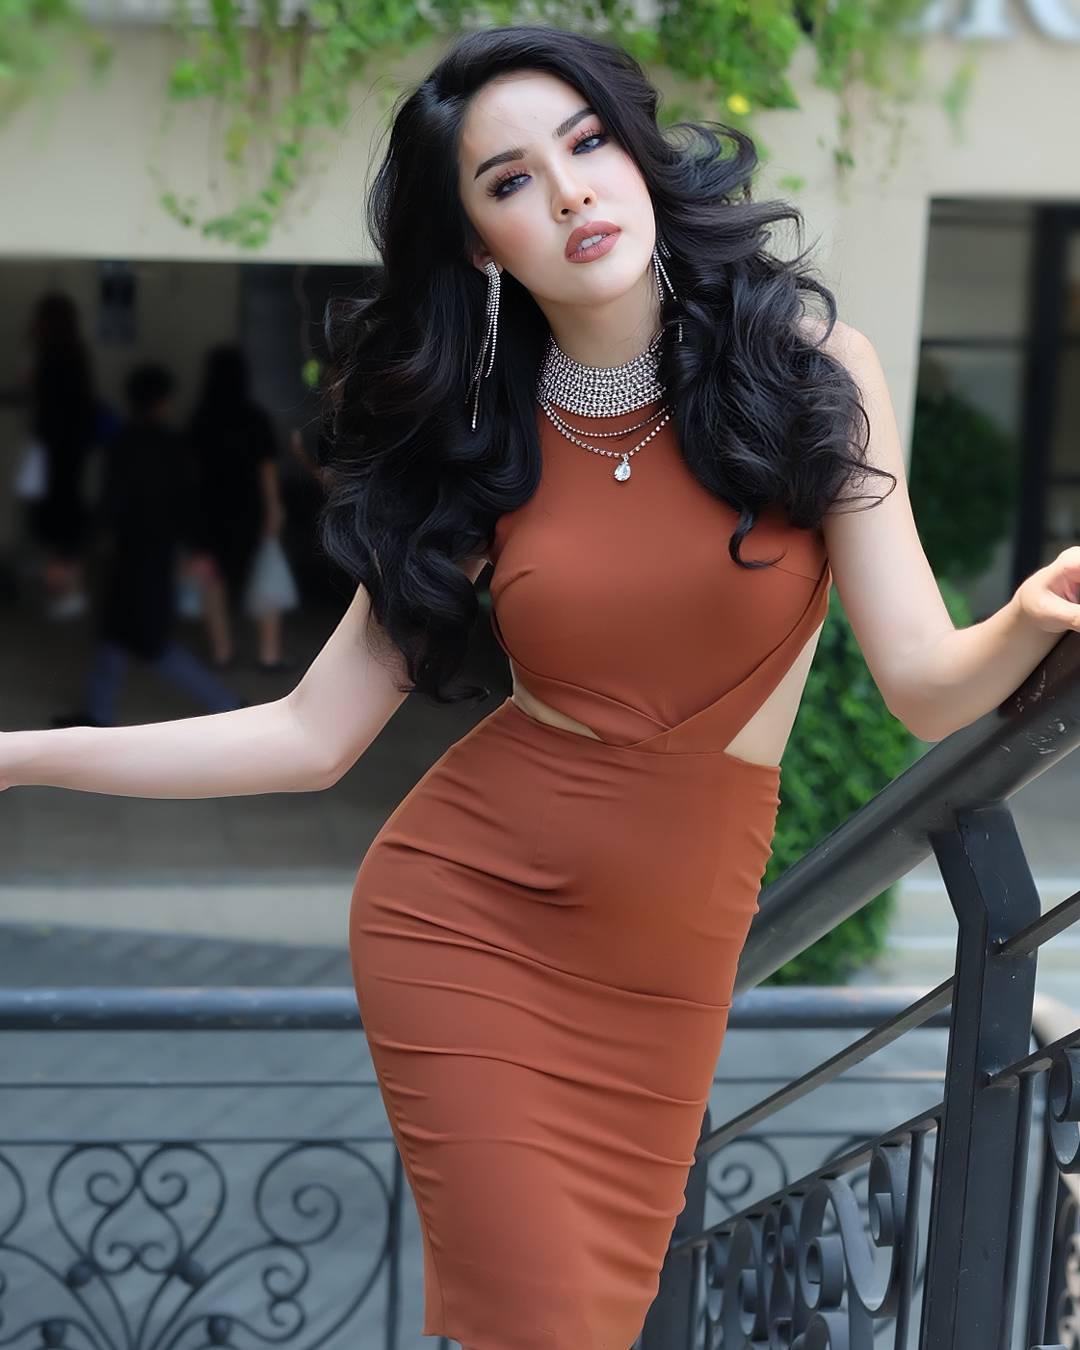 Thai massage ladyboy-9846